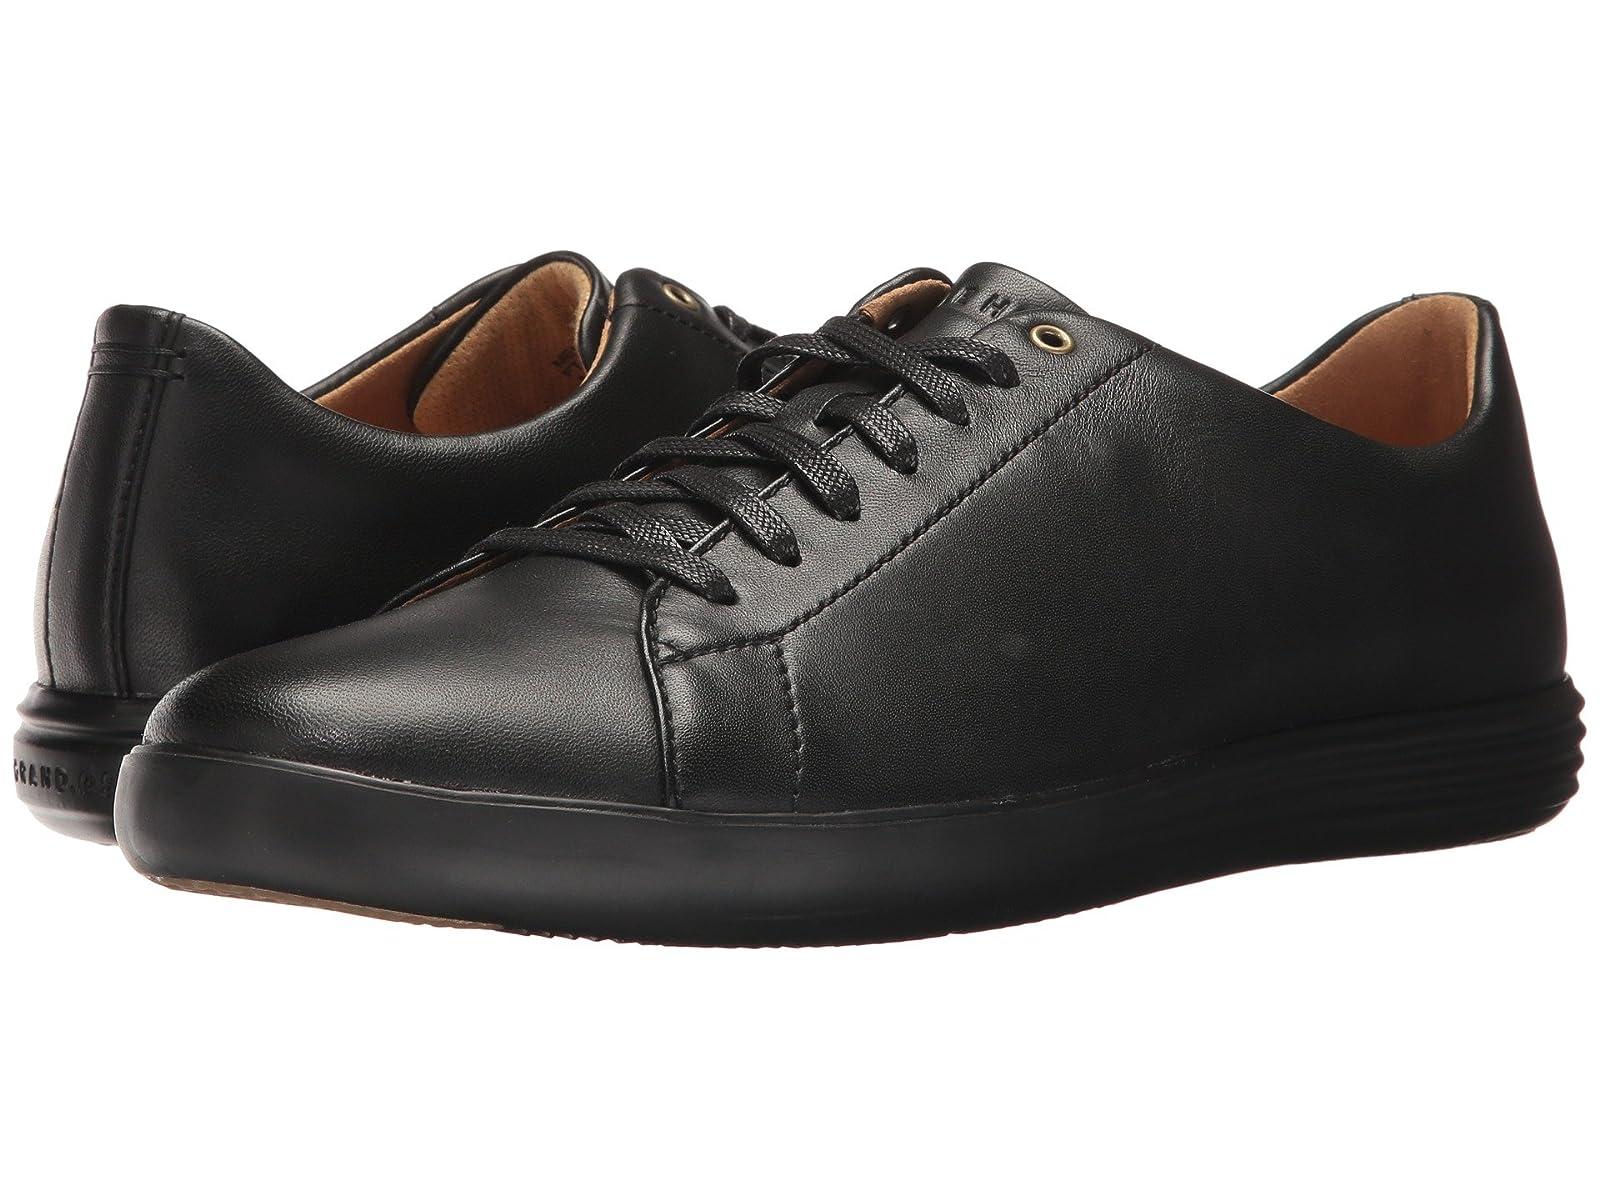 Cole Haan Grand Crosscourt IICheap and distinctive eye-catching shoes